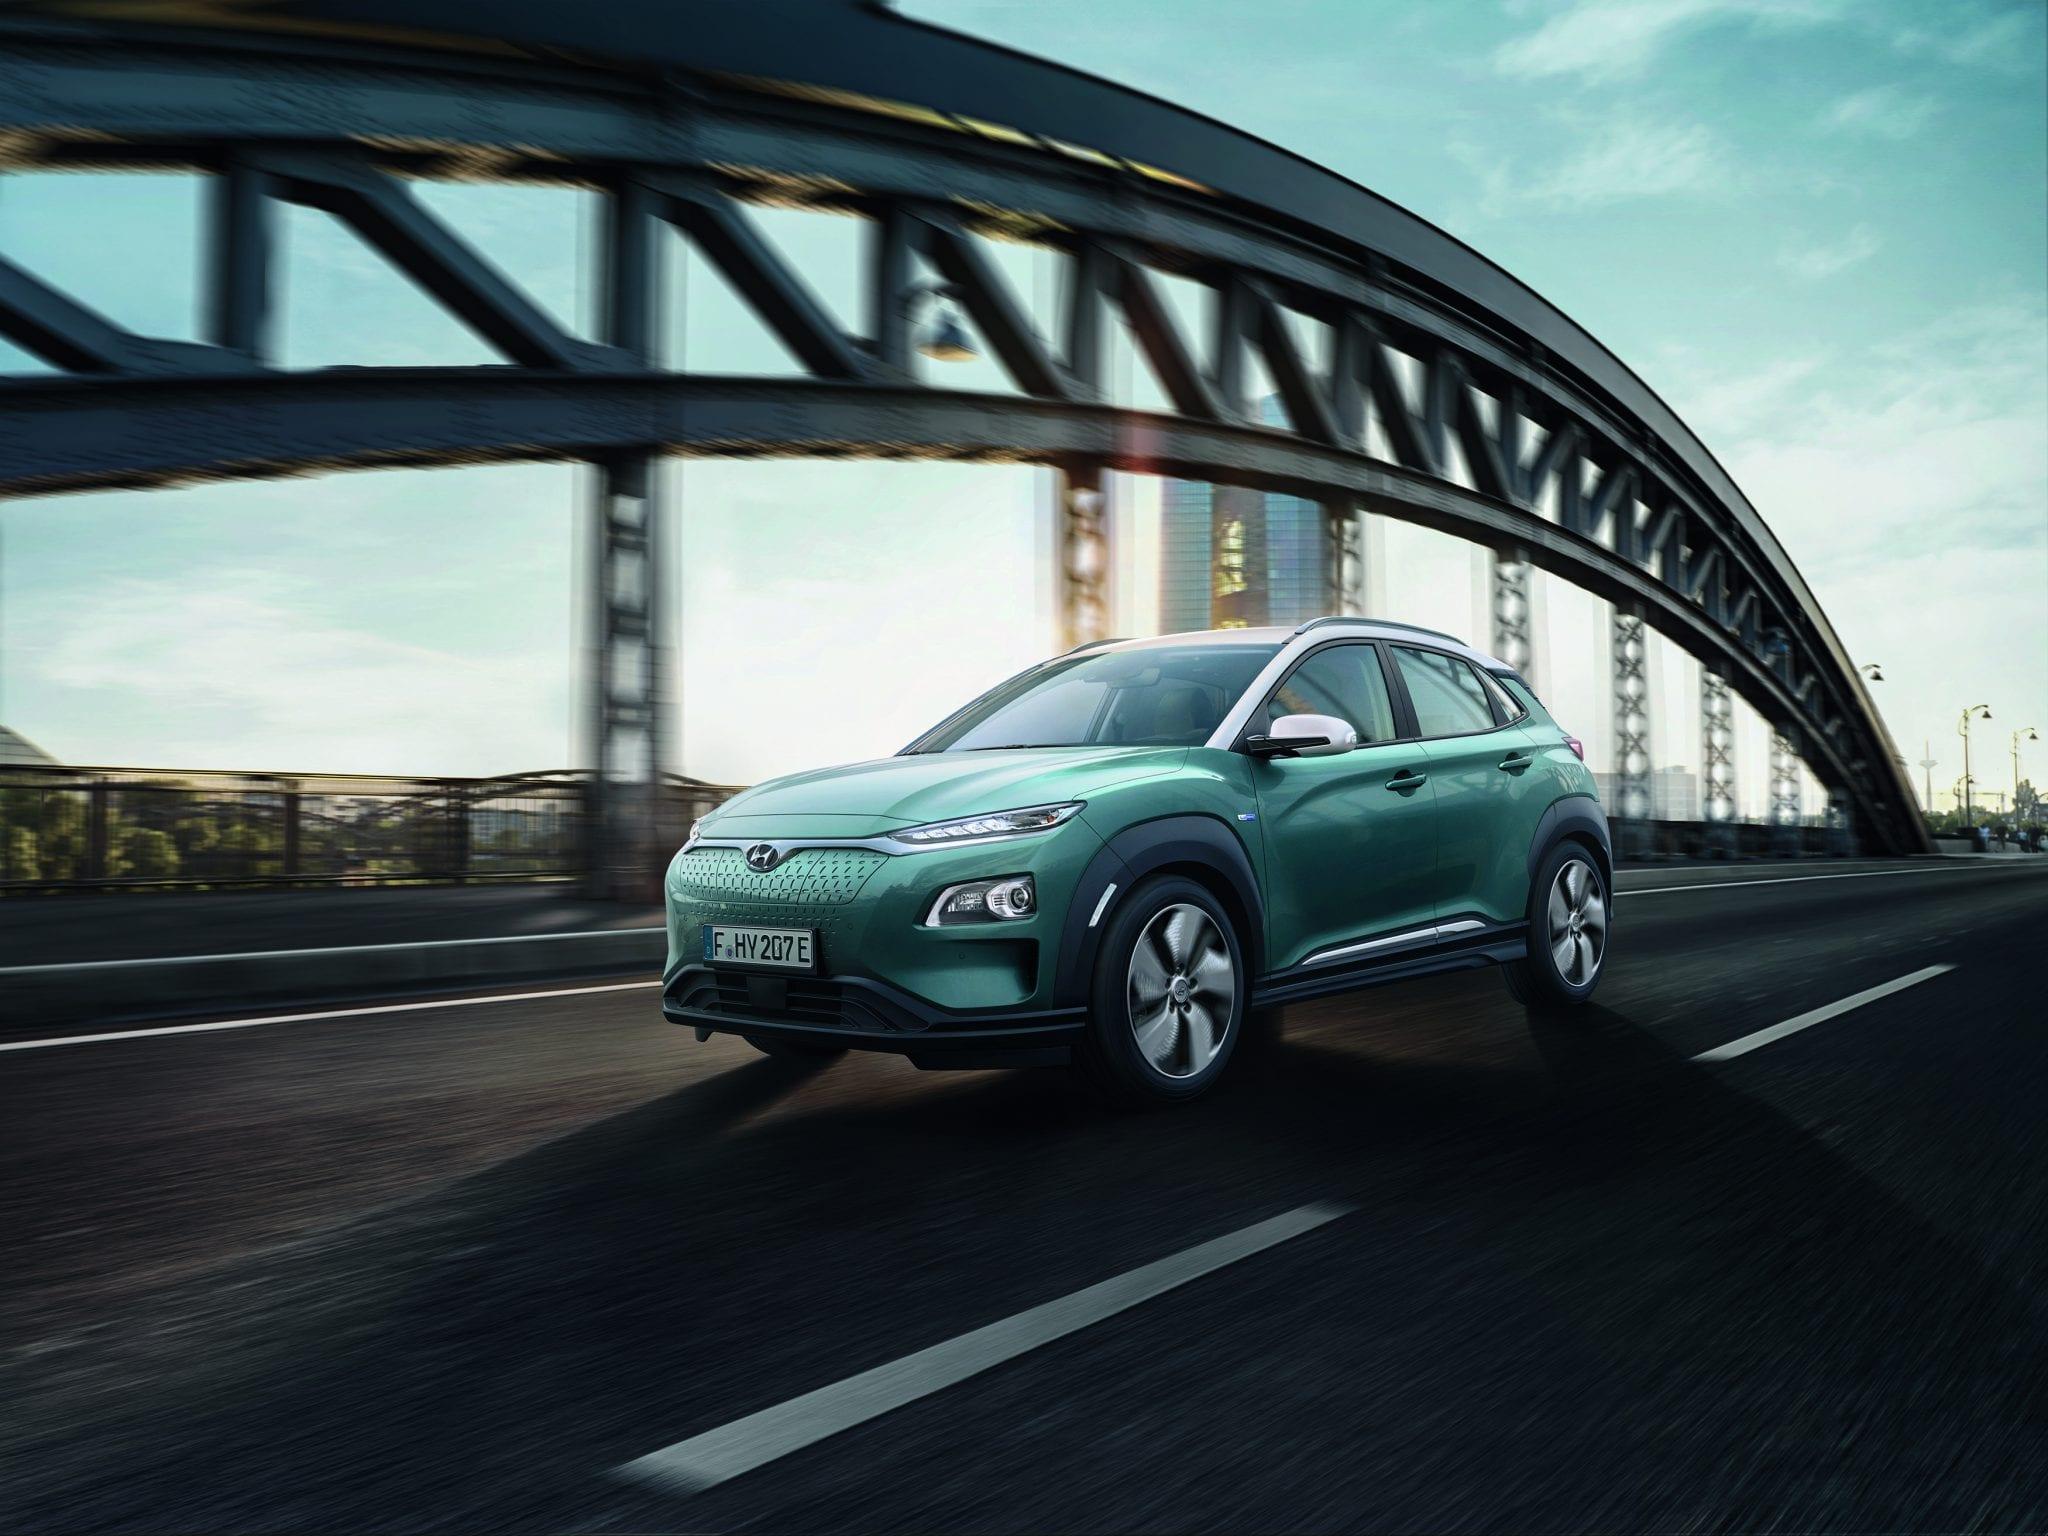 Hyundai Kona EV Limited Sky 64 kWh 8% Bijtelling